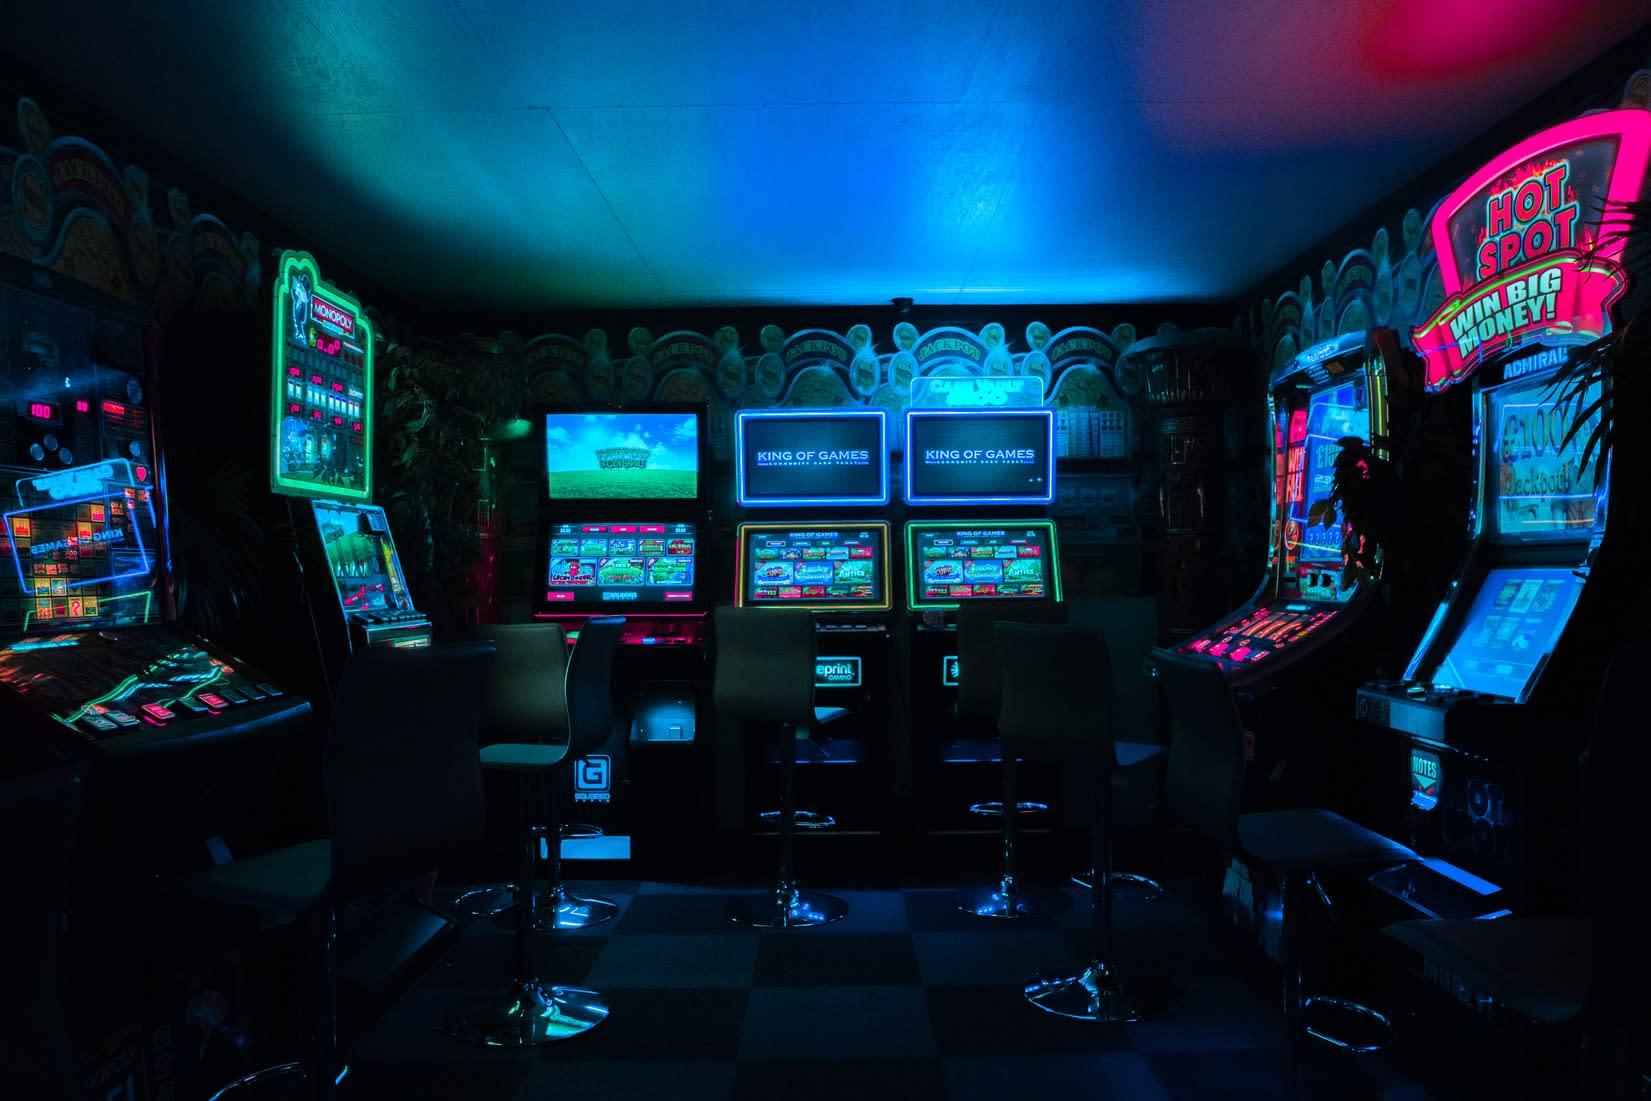 Top Tips for Responsible Gambling